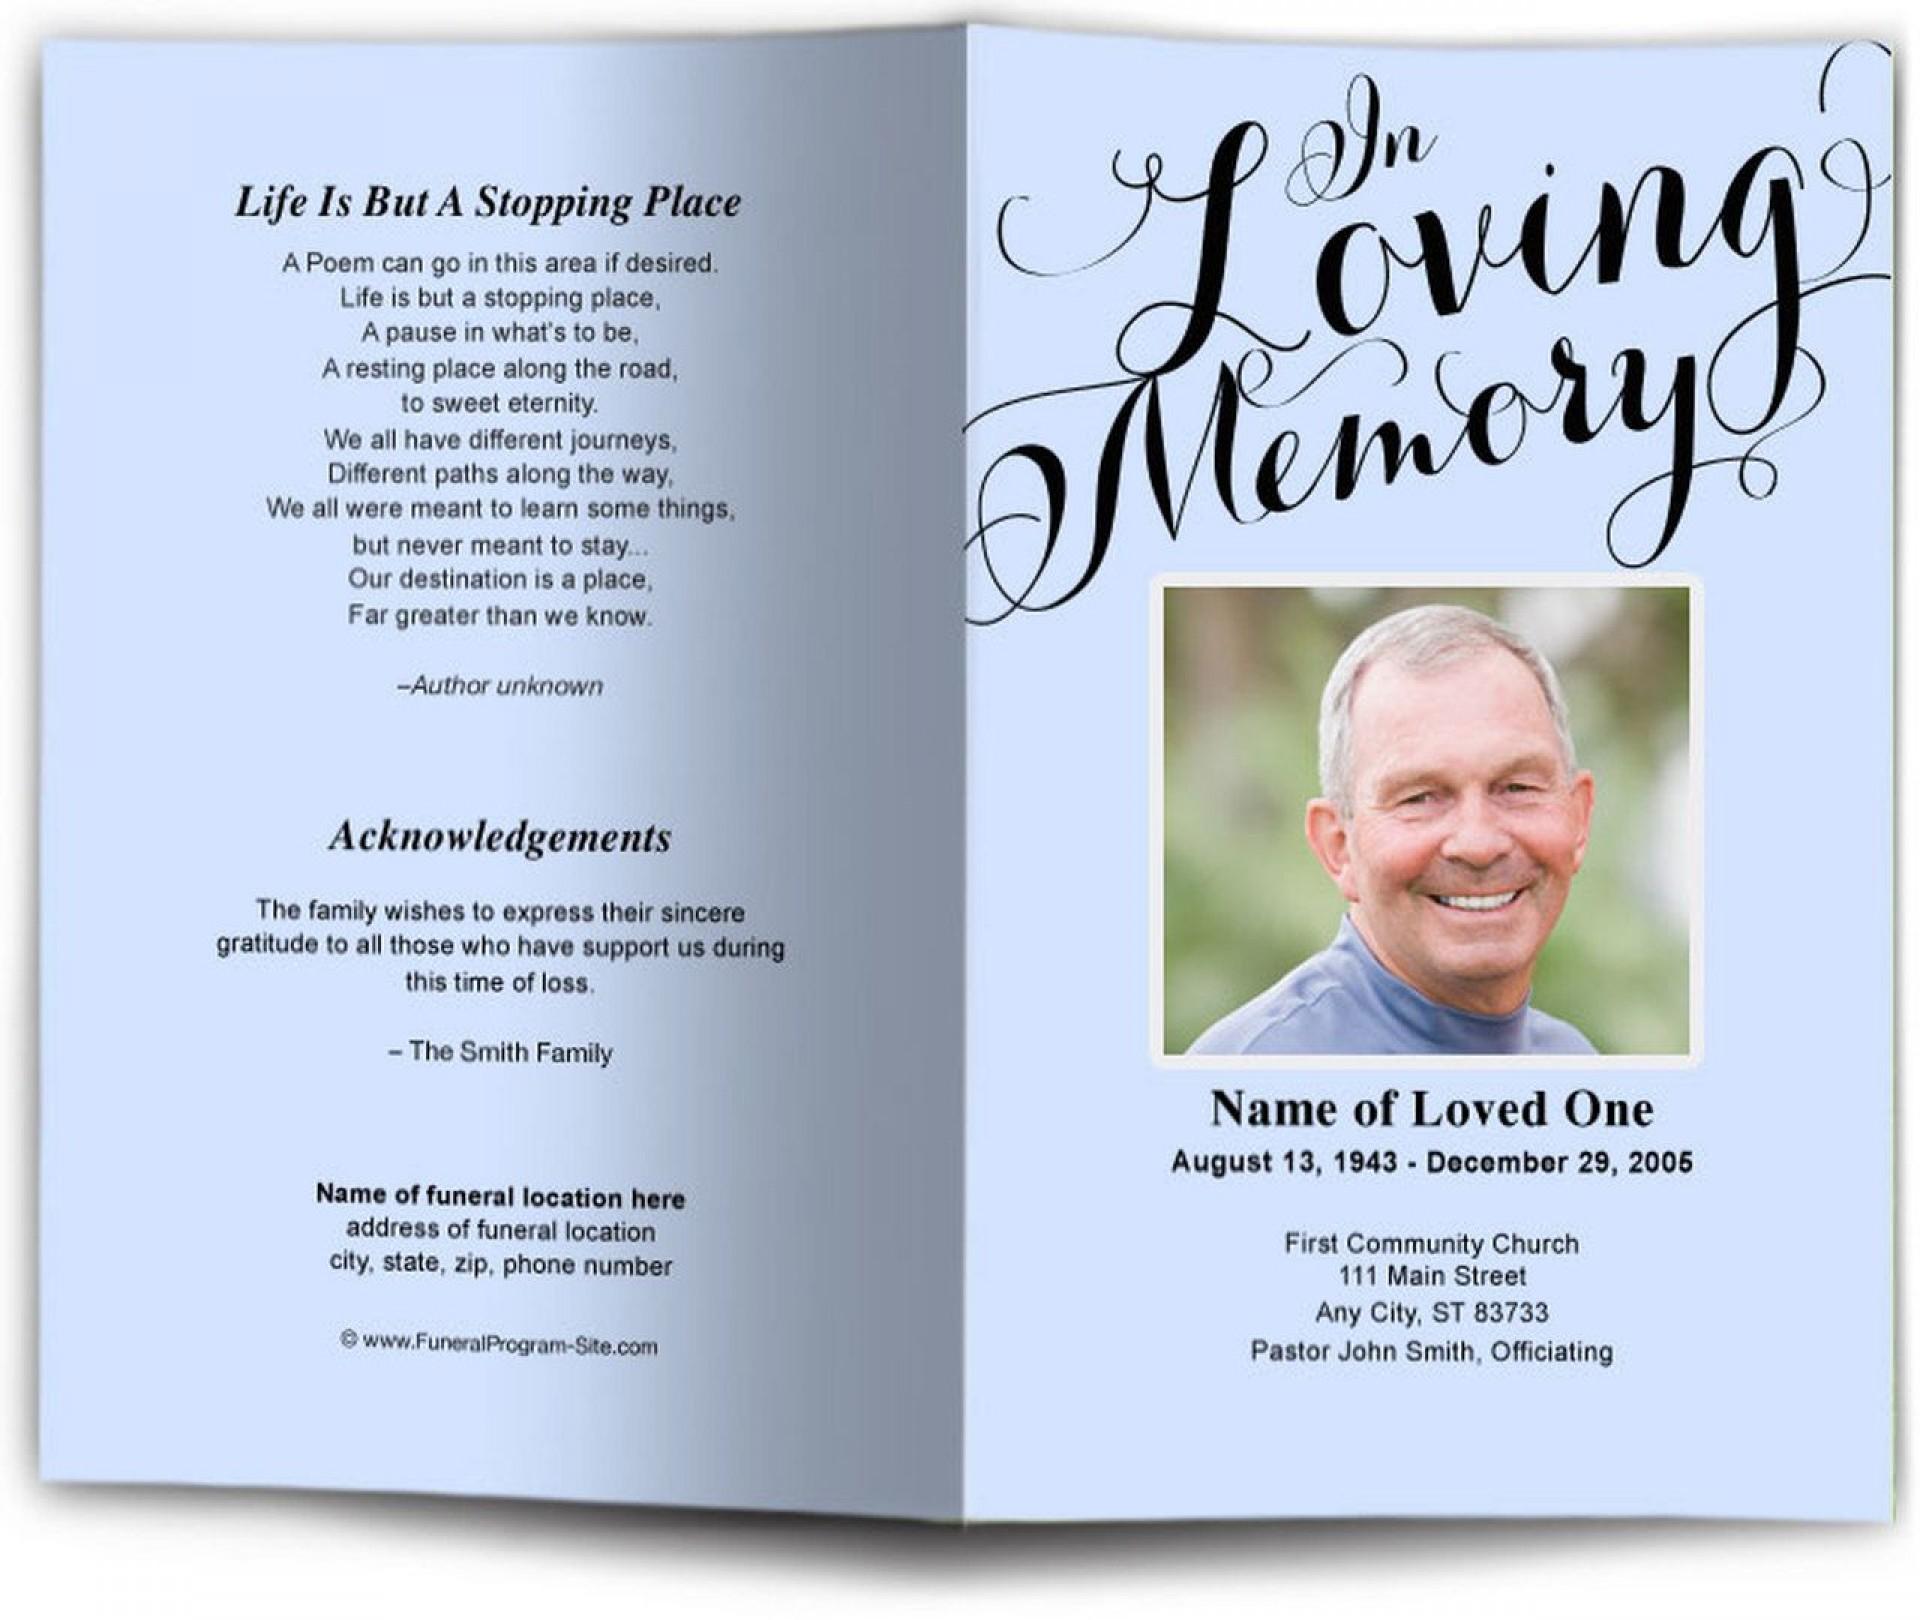 008 Breathtaking In Loving Memory Template Image  Free Download Card Bookmark1920